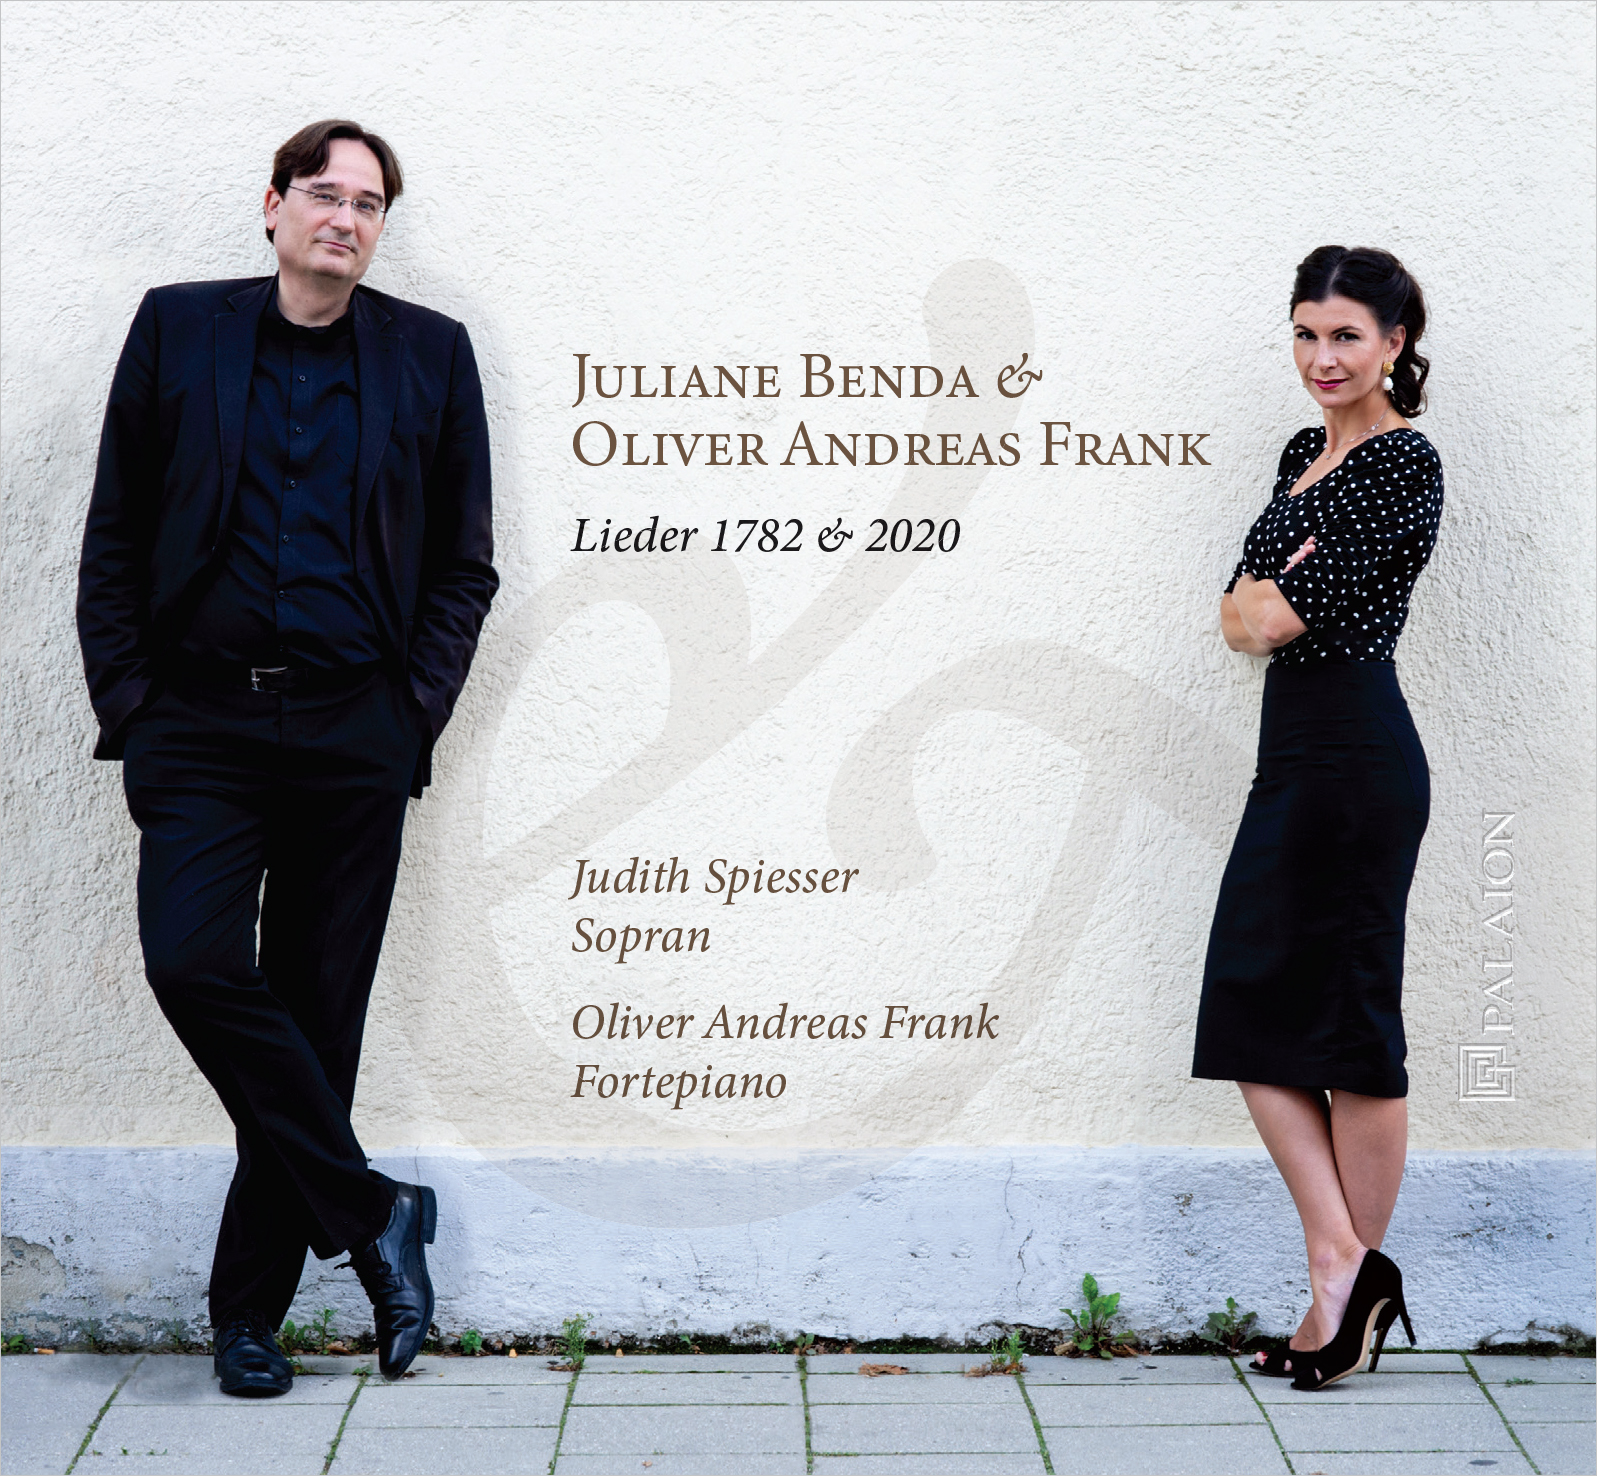 CD_Benda&Frank_frontcover.indd